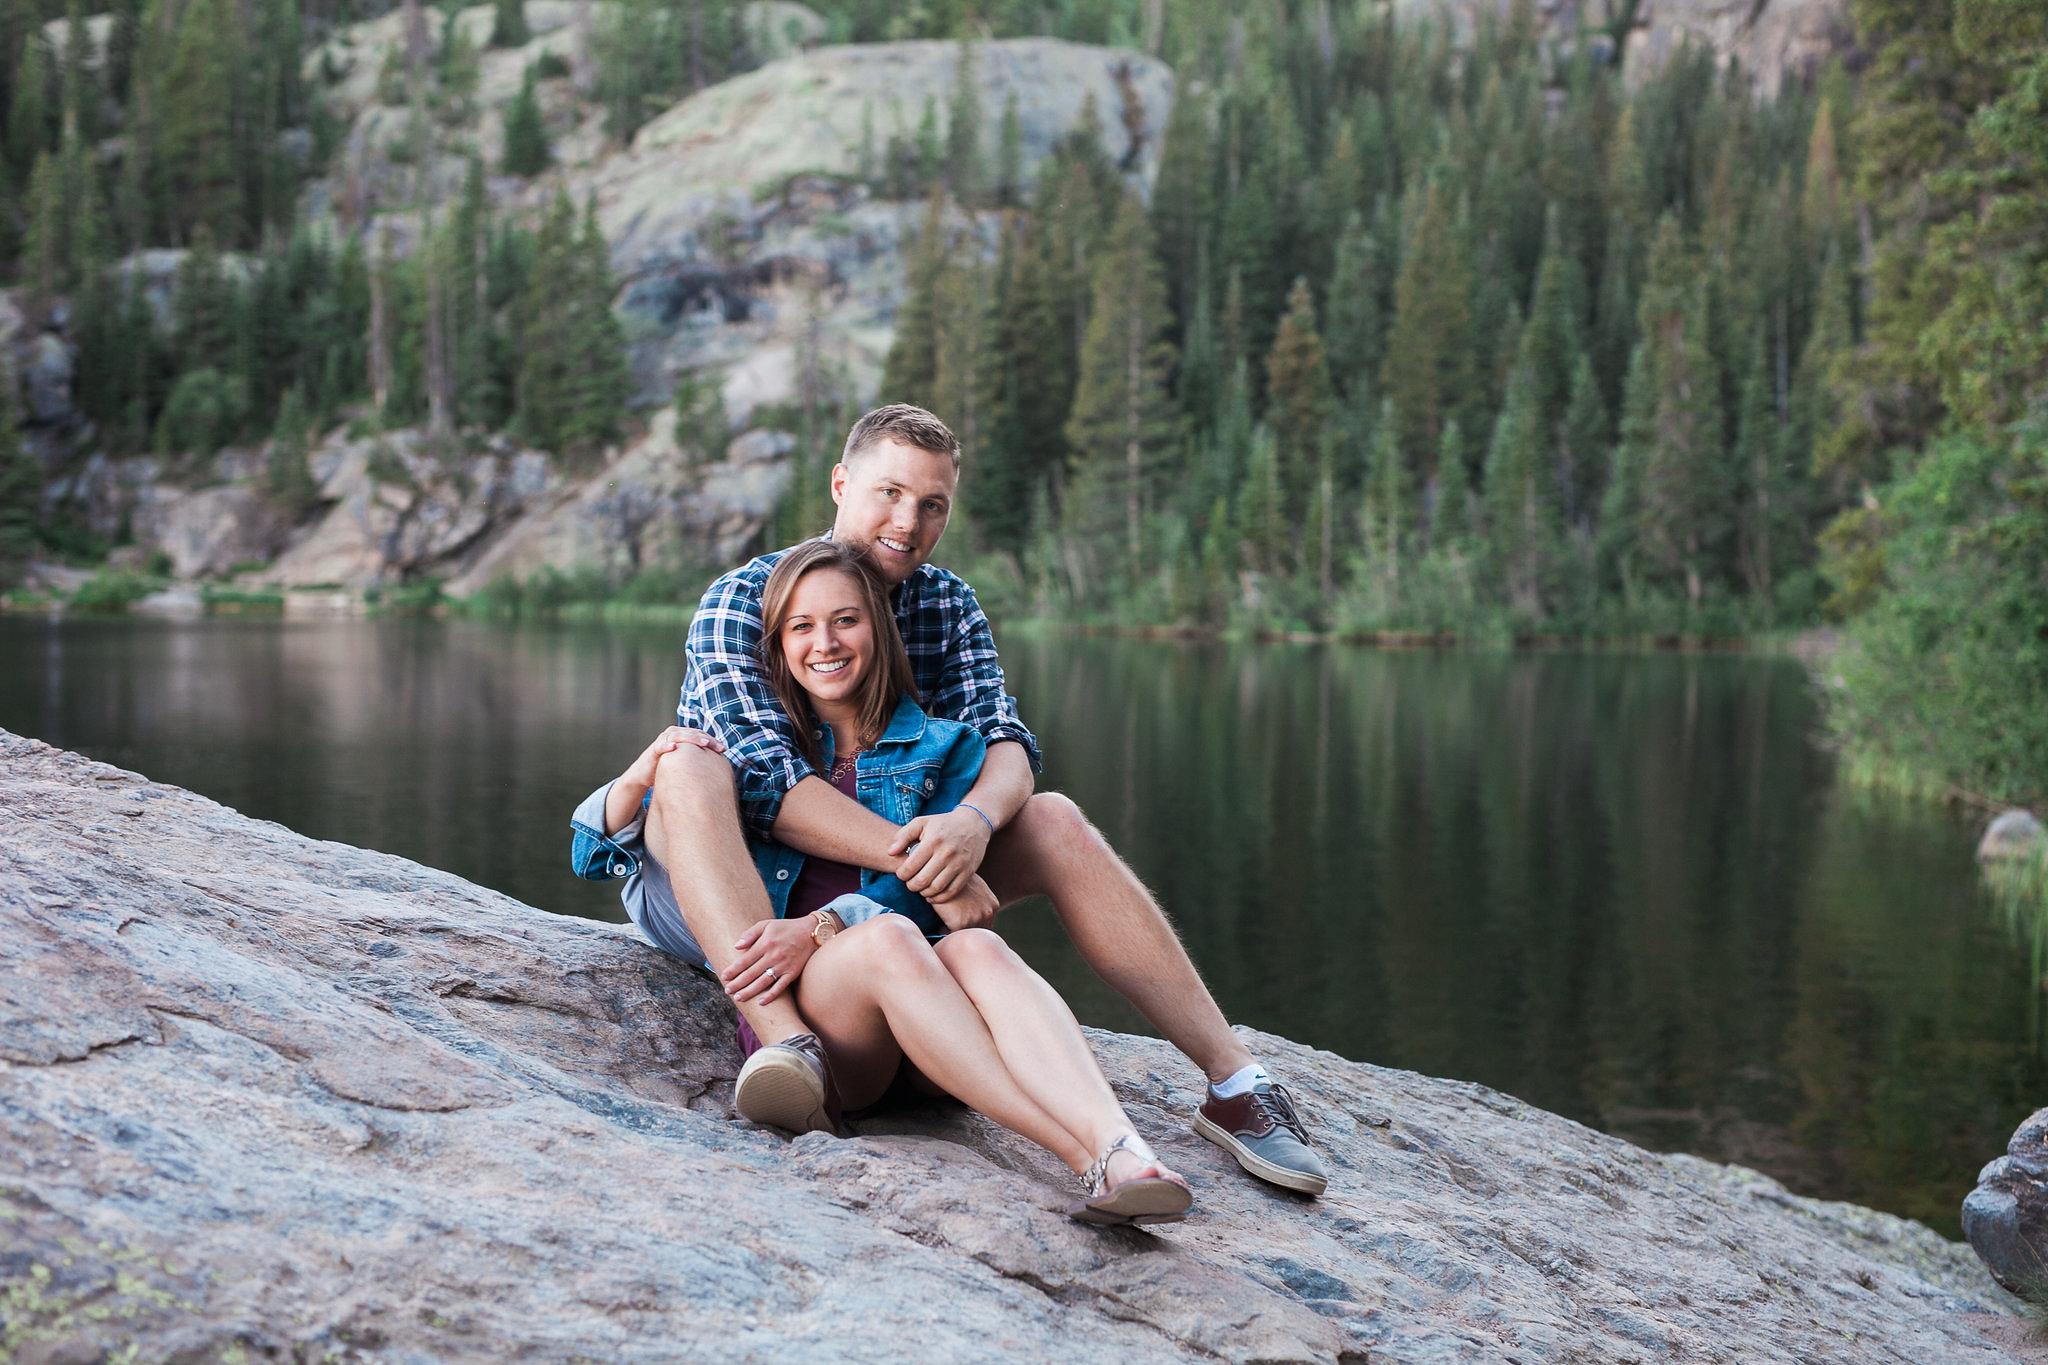 Rocky-Mountain-National-Park-engagement_014.jpg